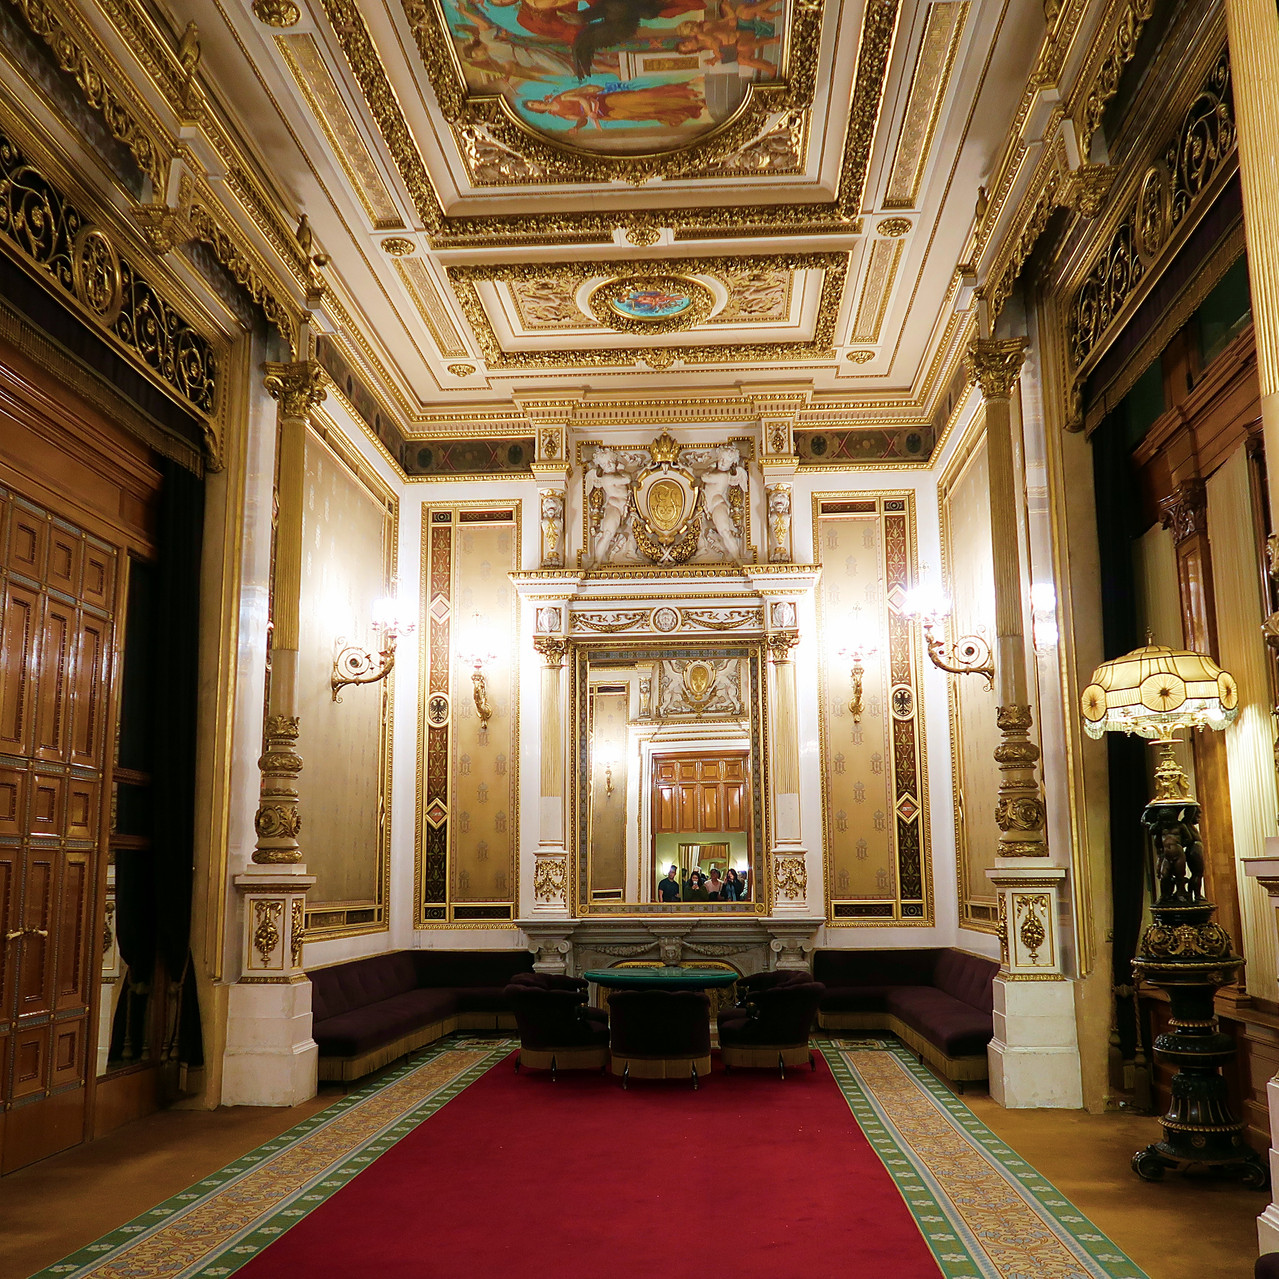 Vienna's Operahouse (Wiener Staatsoper)